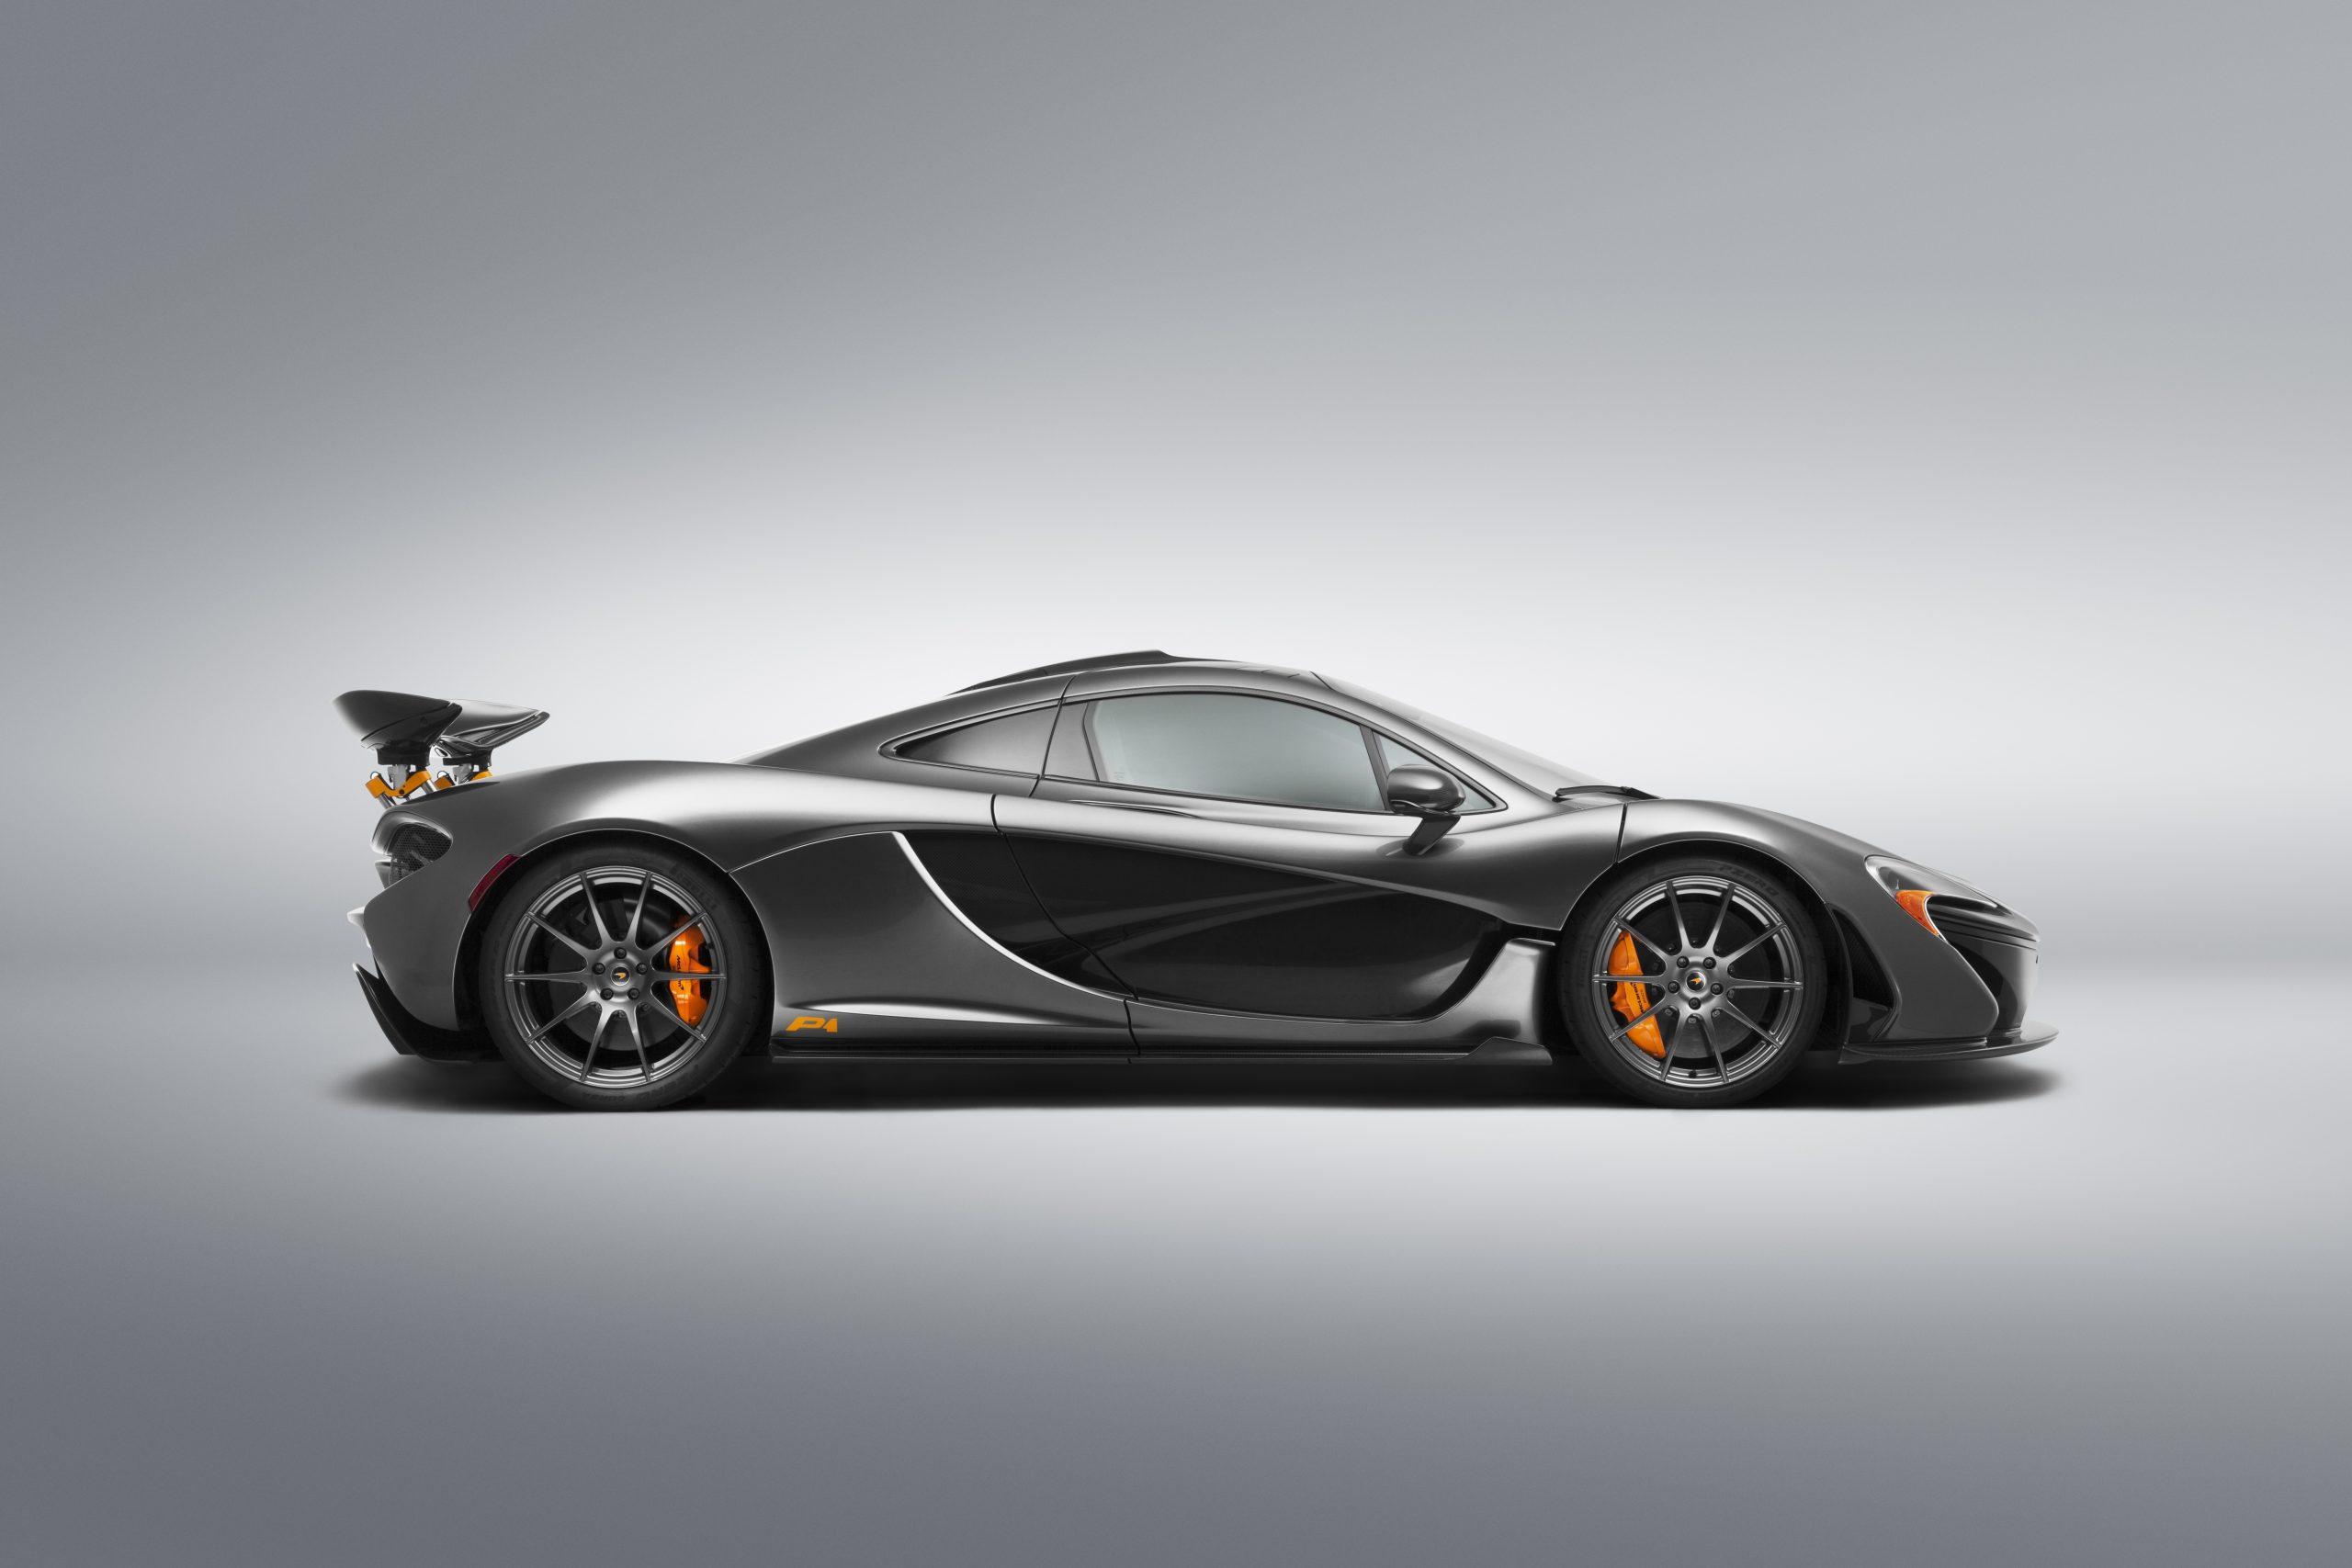 McLaren P1 MSO color scheme